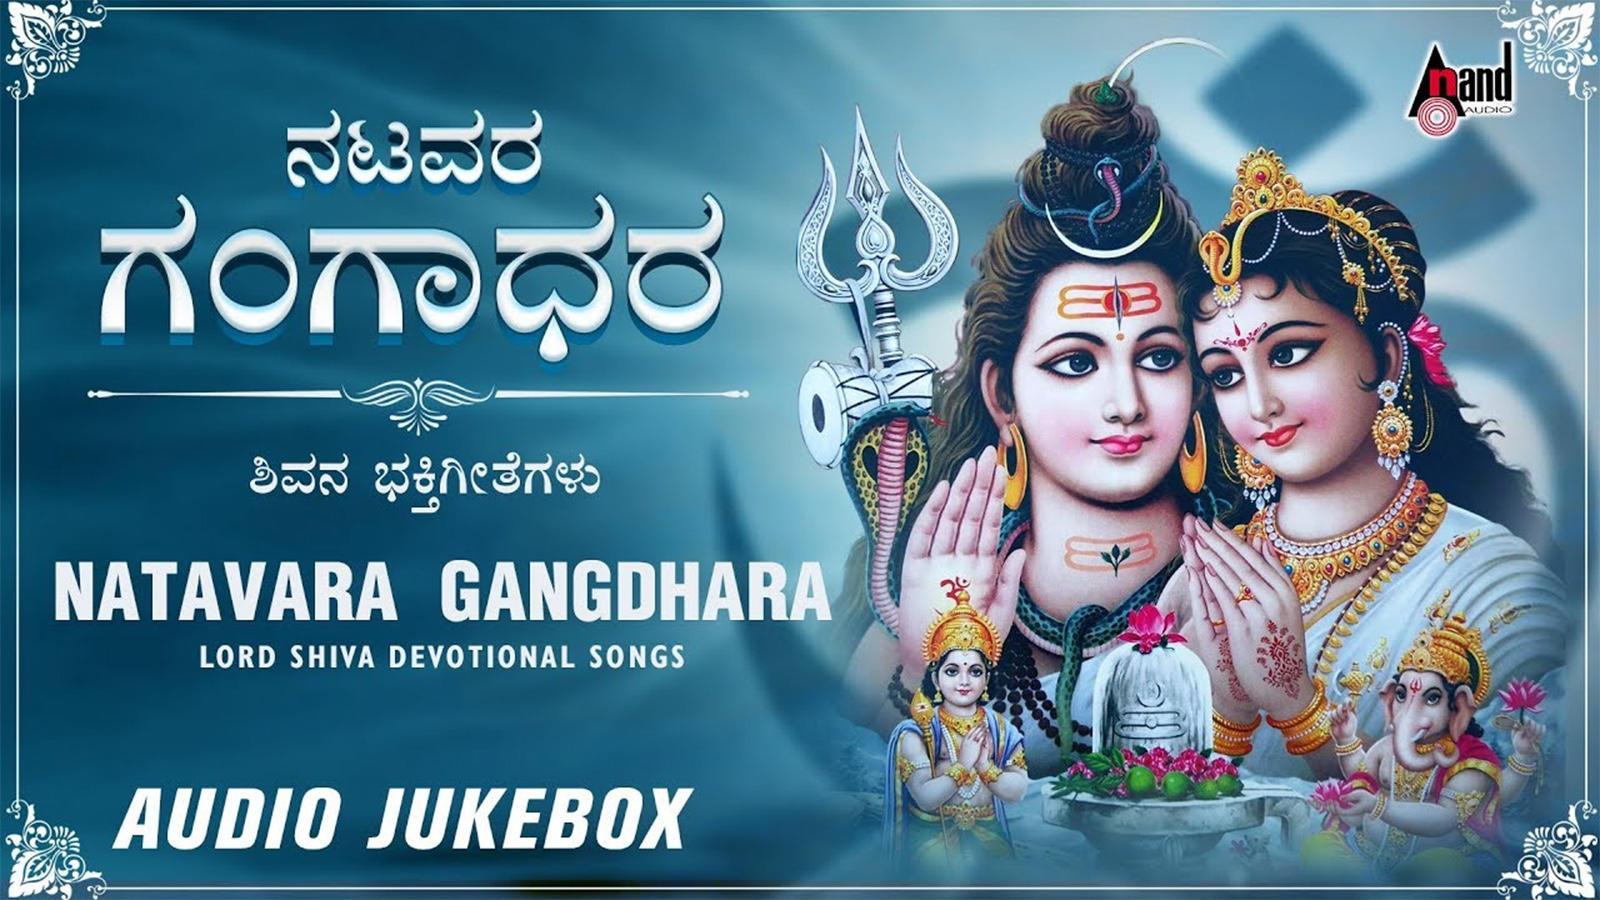 Lord Shiva Devotional Songs Kannada Bhakti Song Natavara Gangadhara Jukebox Lifestyle Times Of India Videos